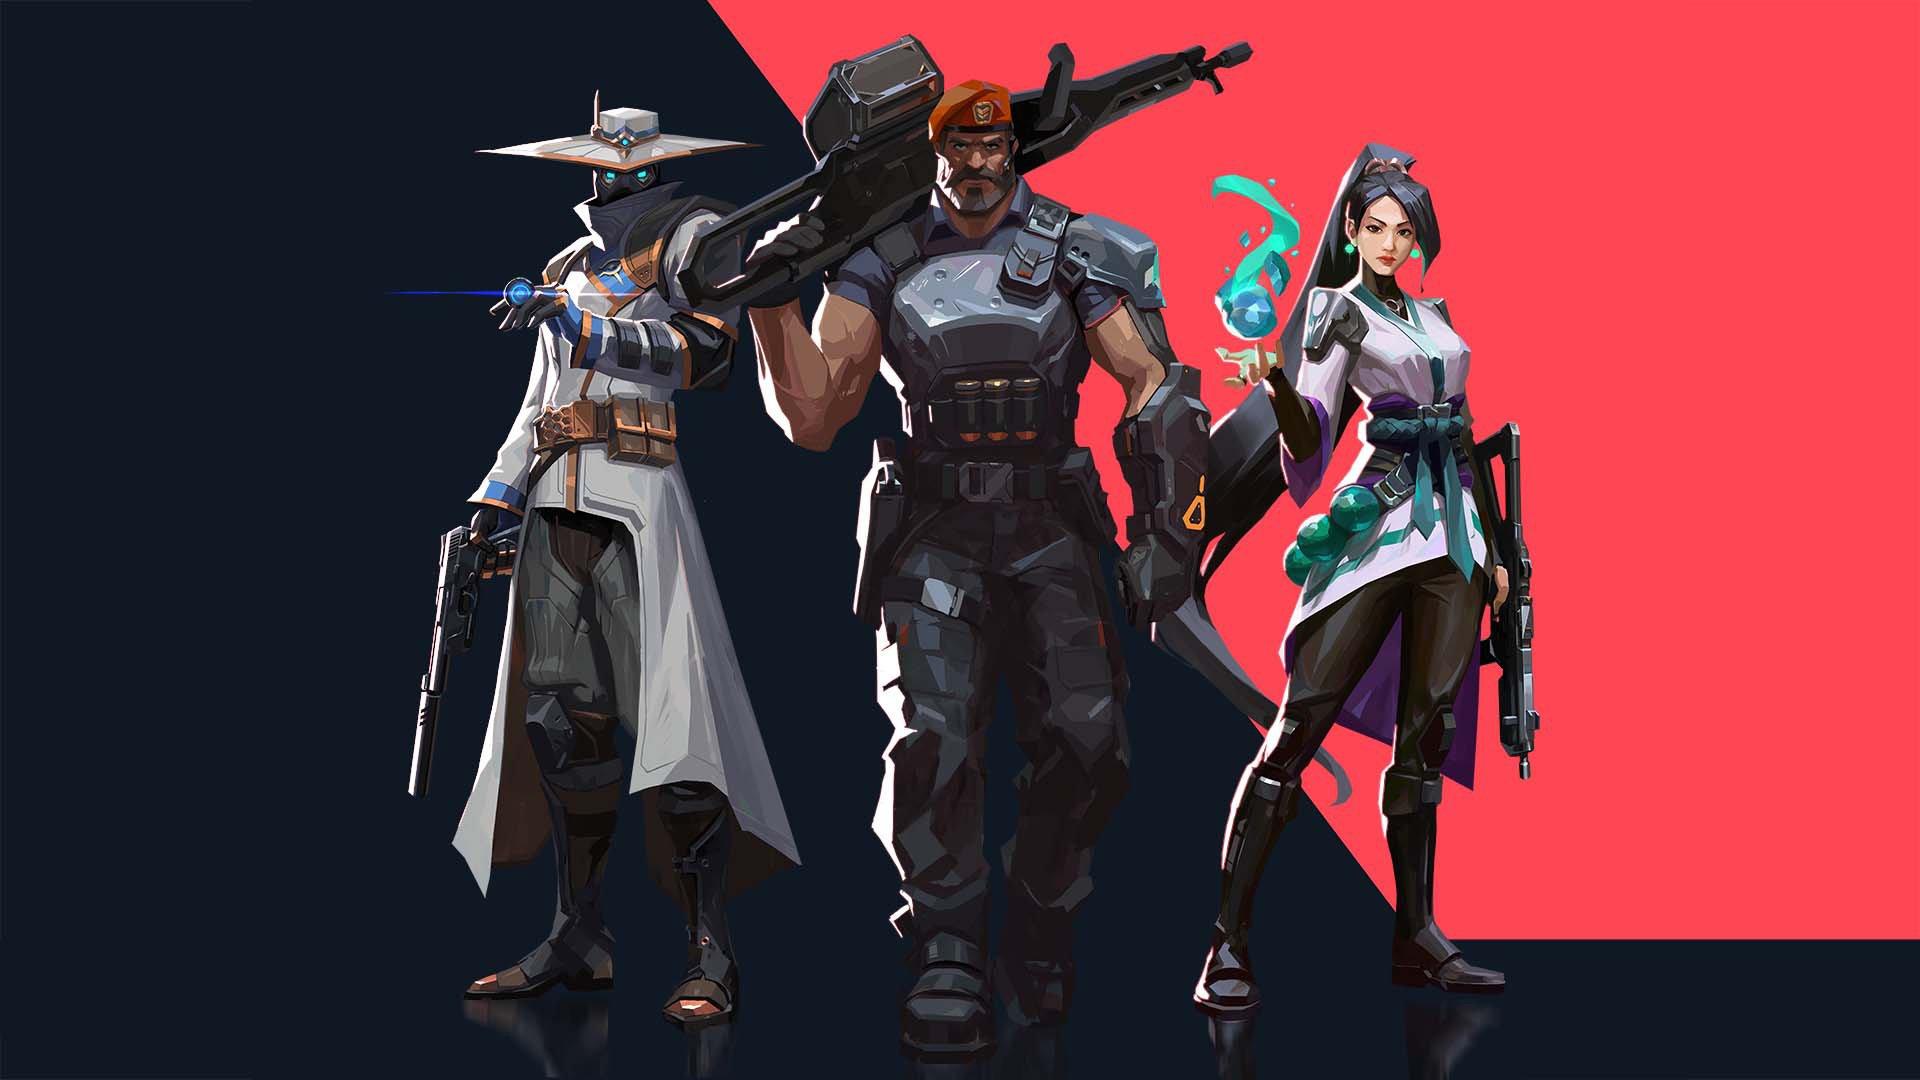 riot-games-ve-coca-coladan-yeni-is-birligi-2